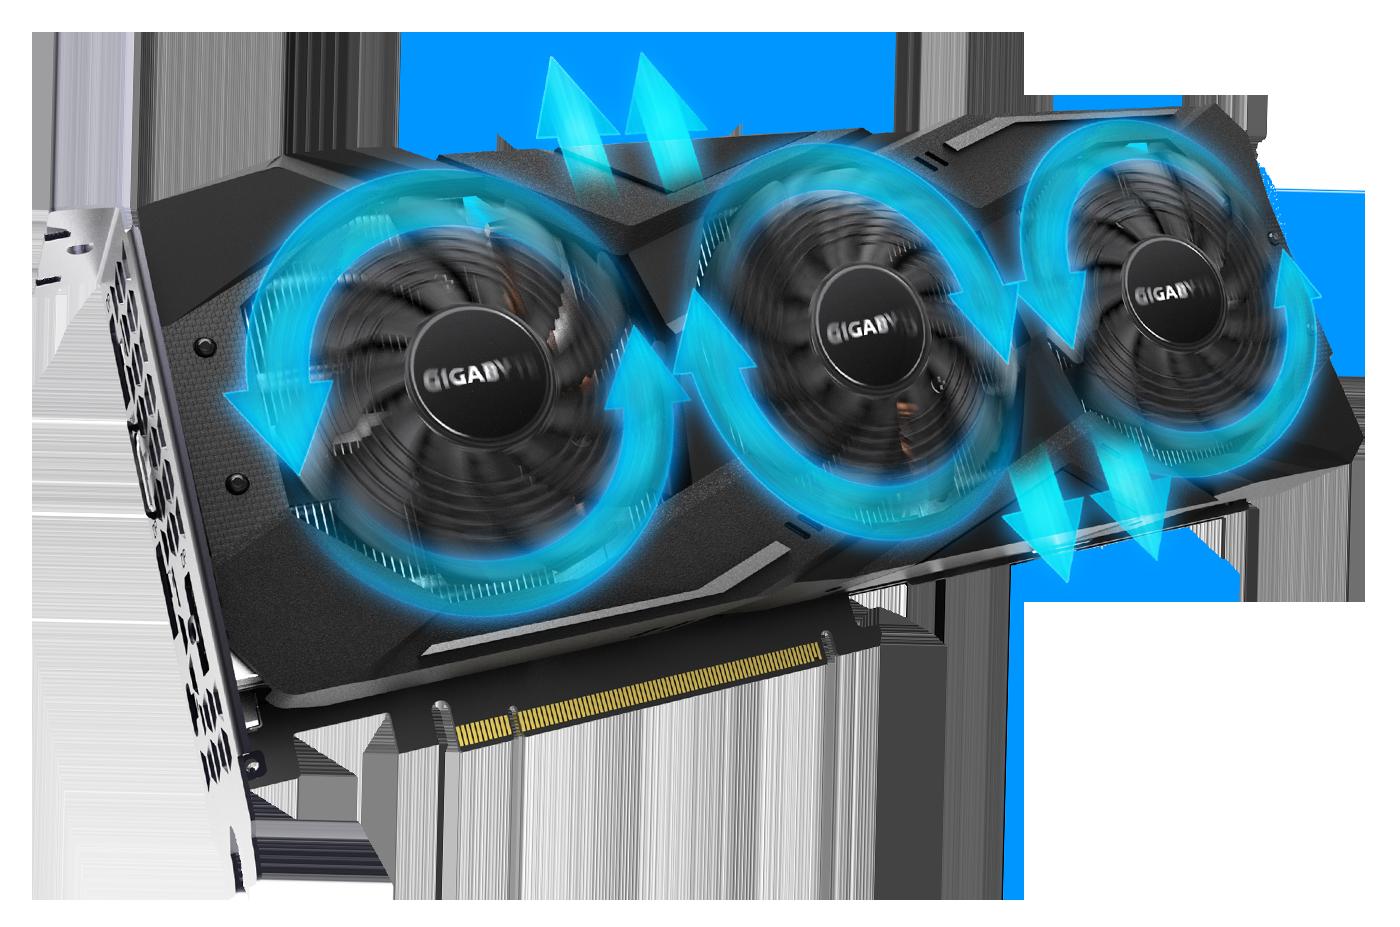 Gigabyte Geforce RTX 2080 Ti 11GB Windforce 2